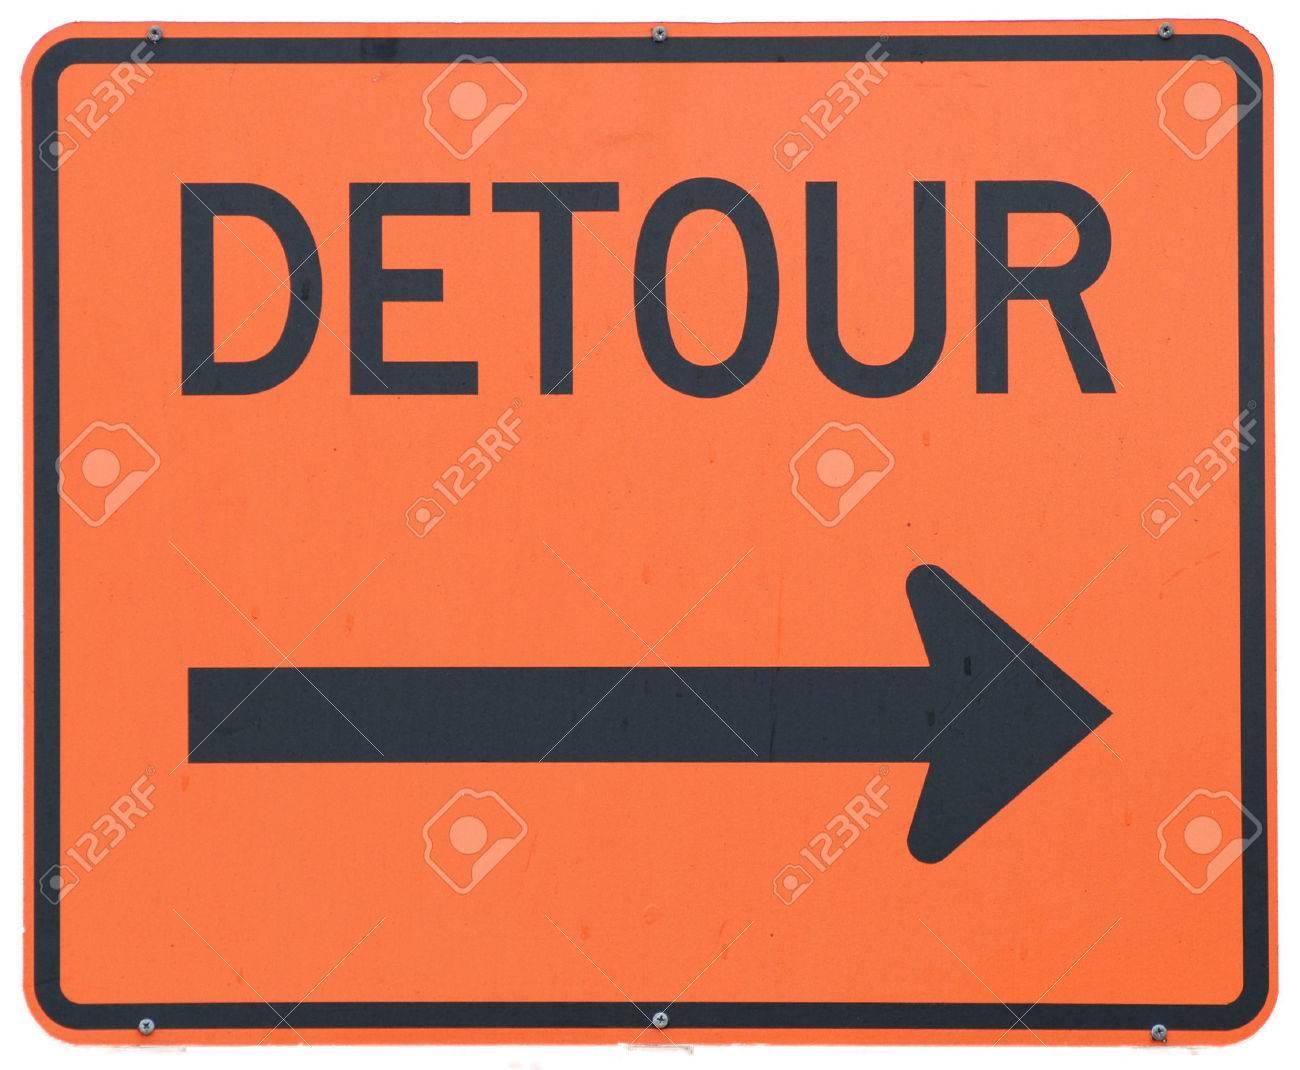 Detour Right road sign Stock Photo - 1439617